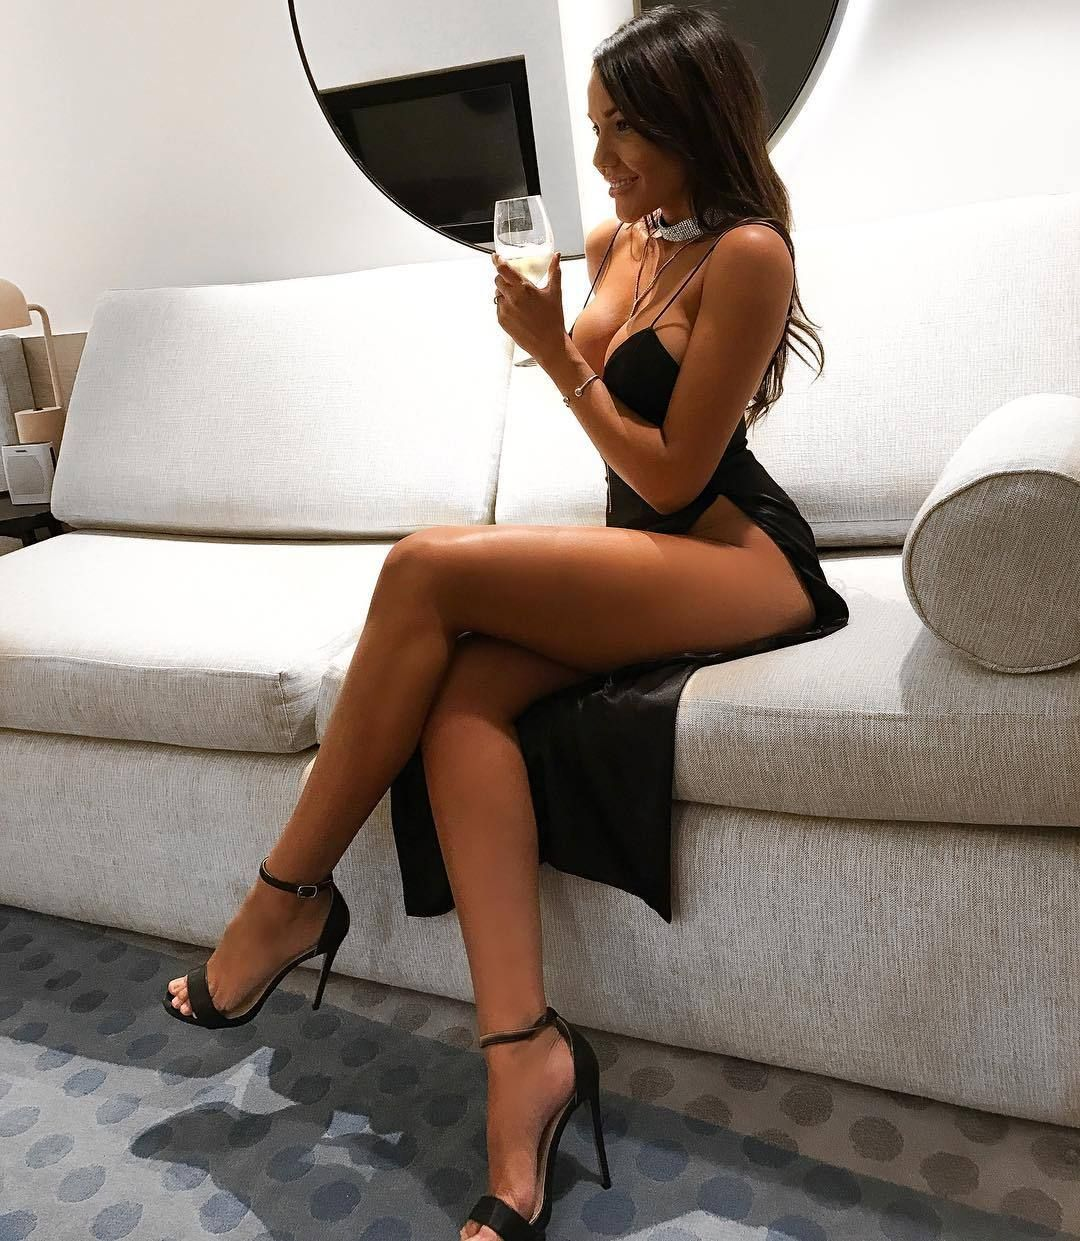 Cleavage Davina Rankin nude photos 2019